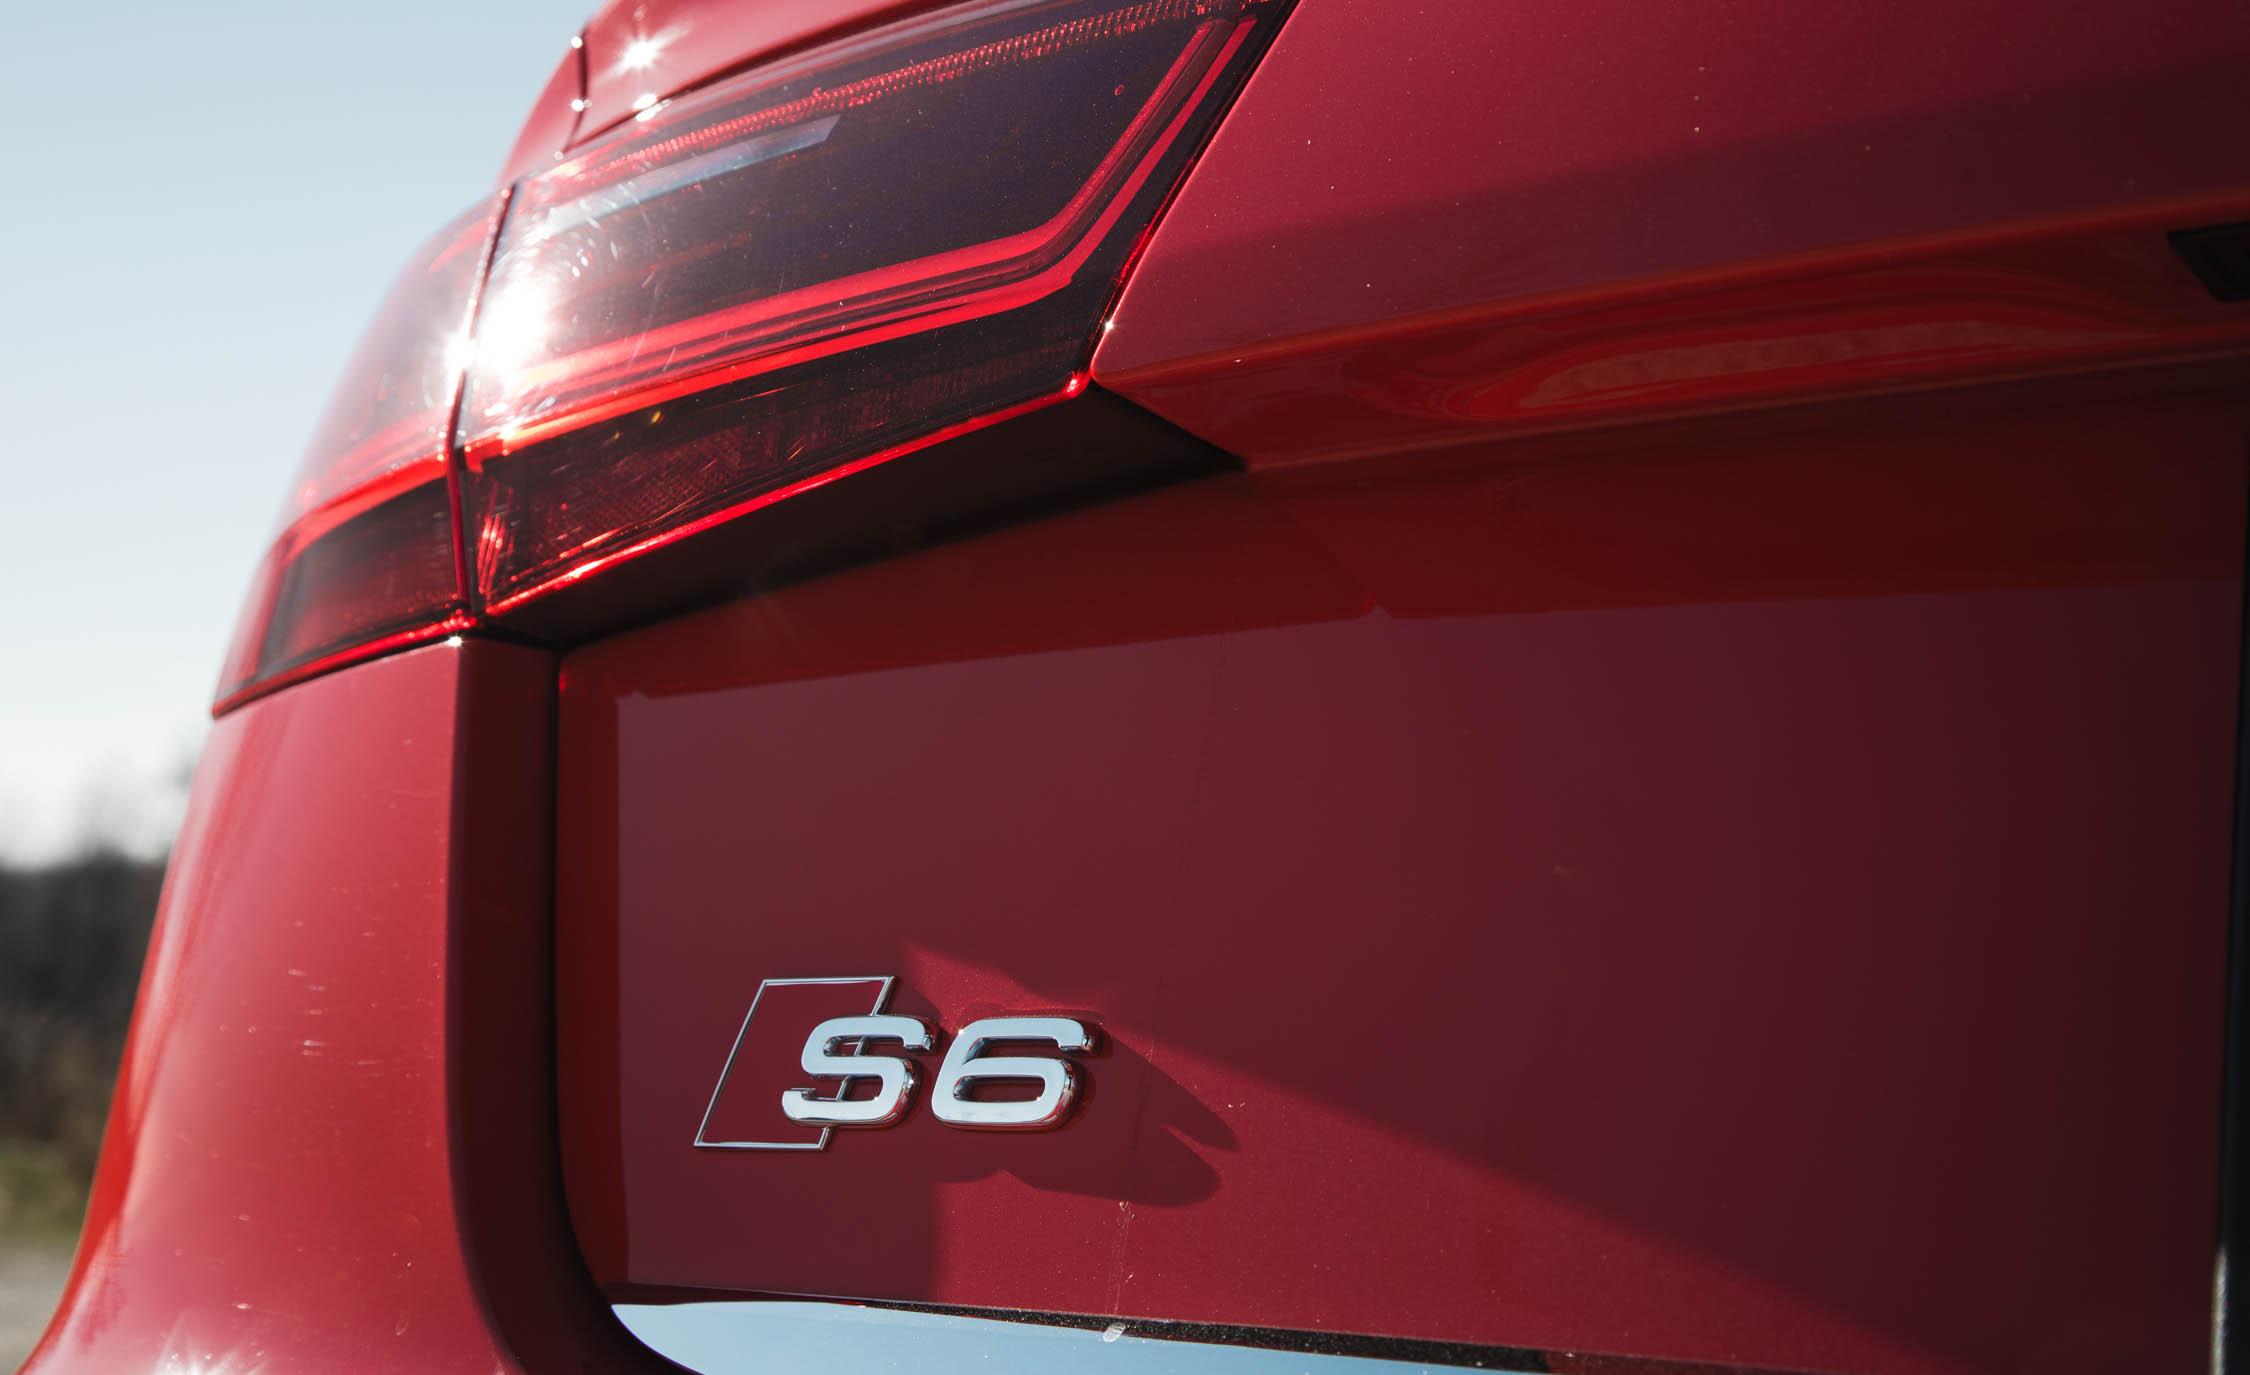 2016 Audi S6 Exterior Badge Rear